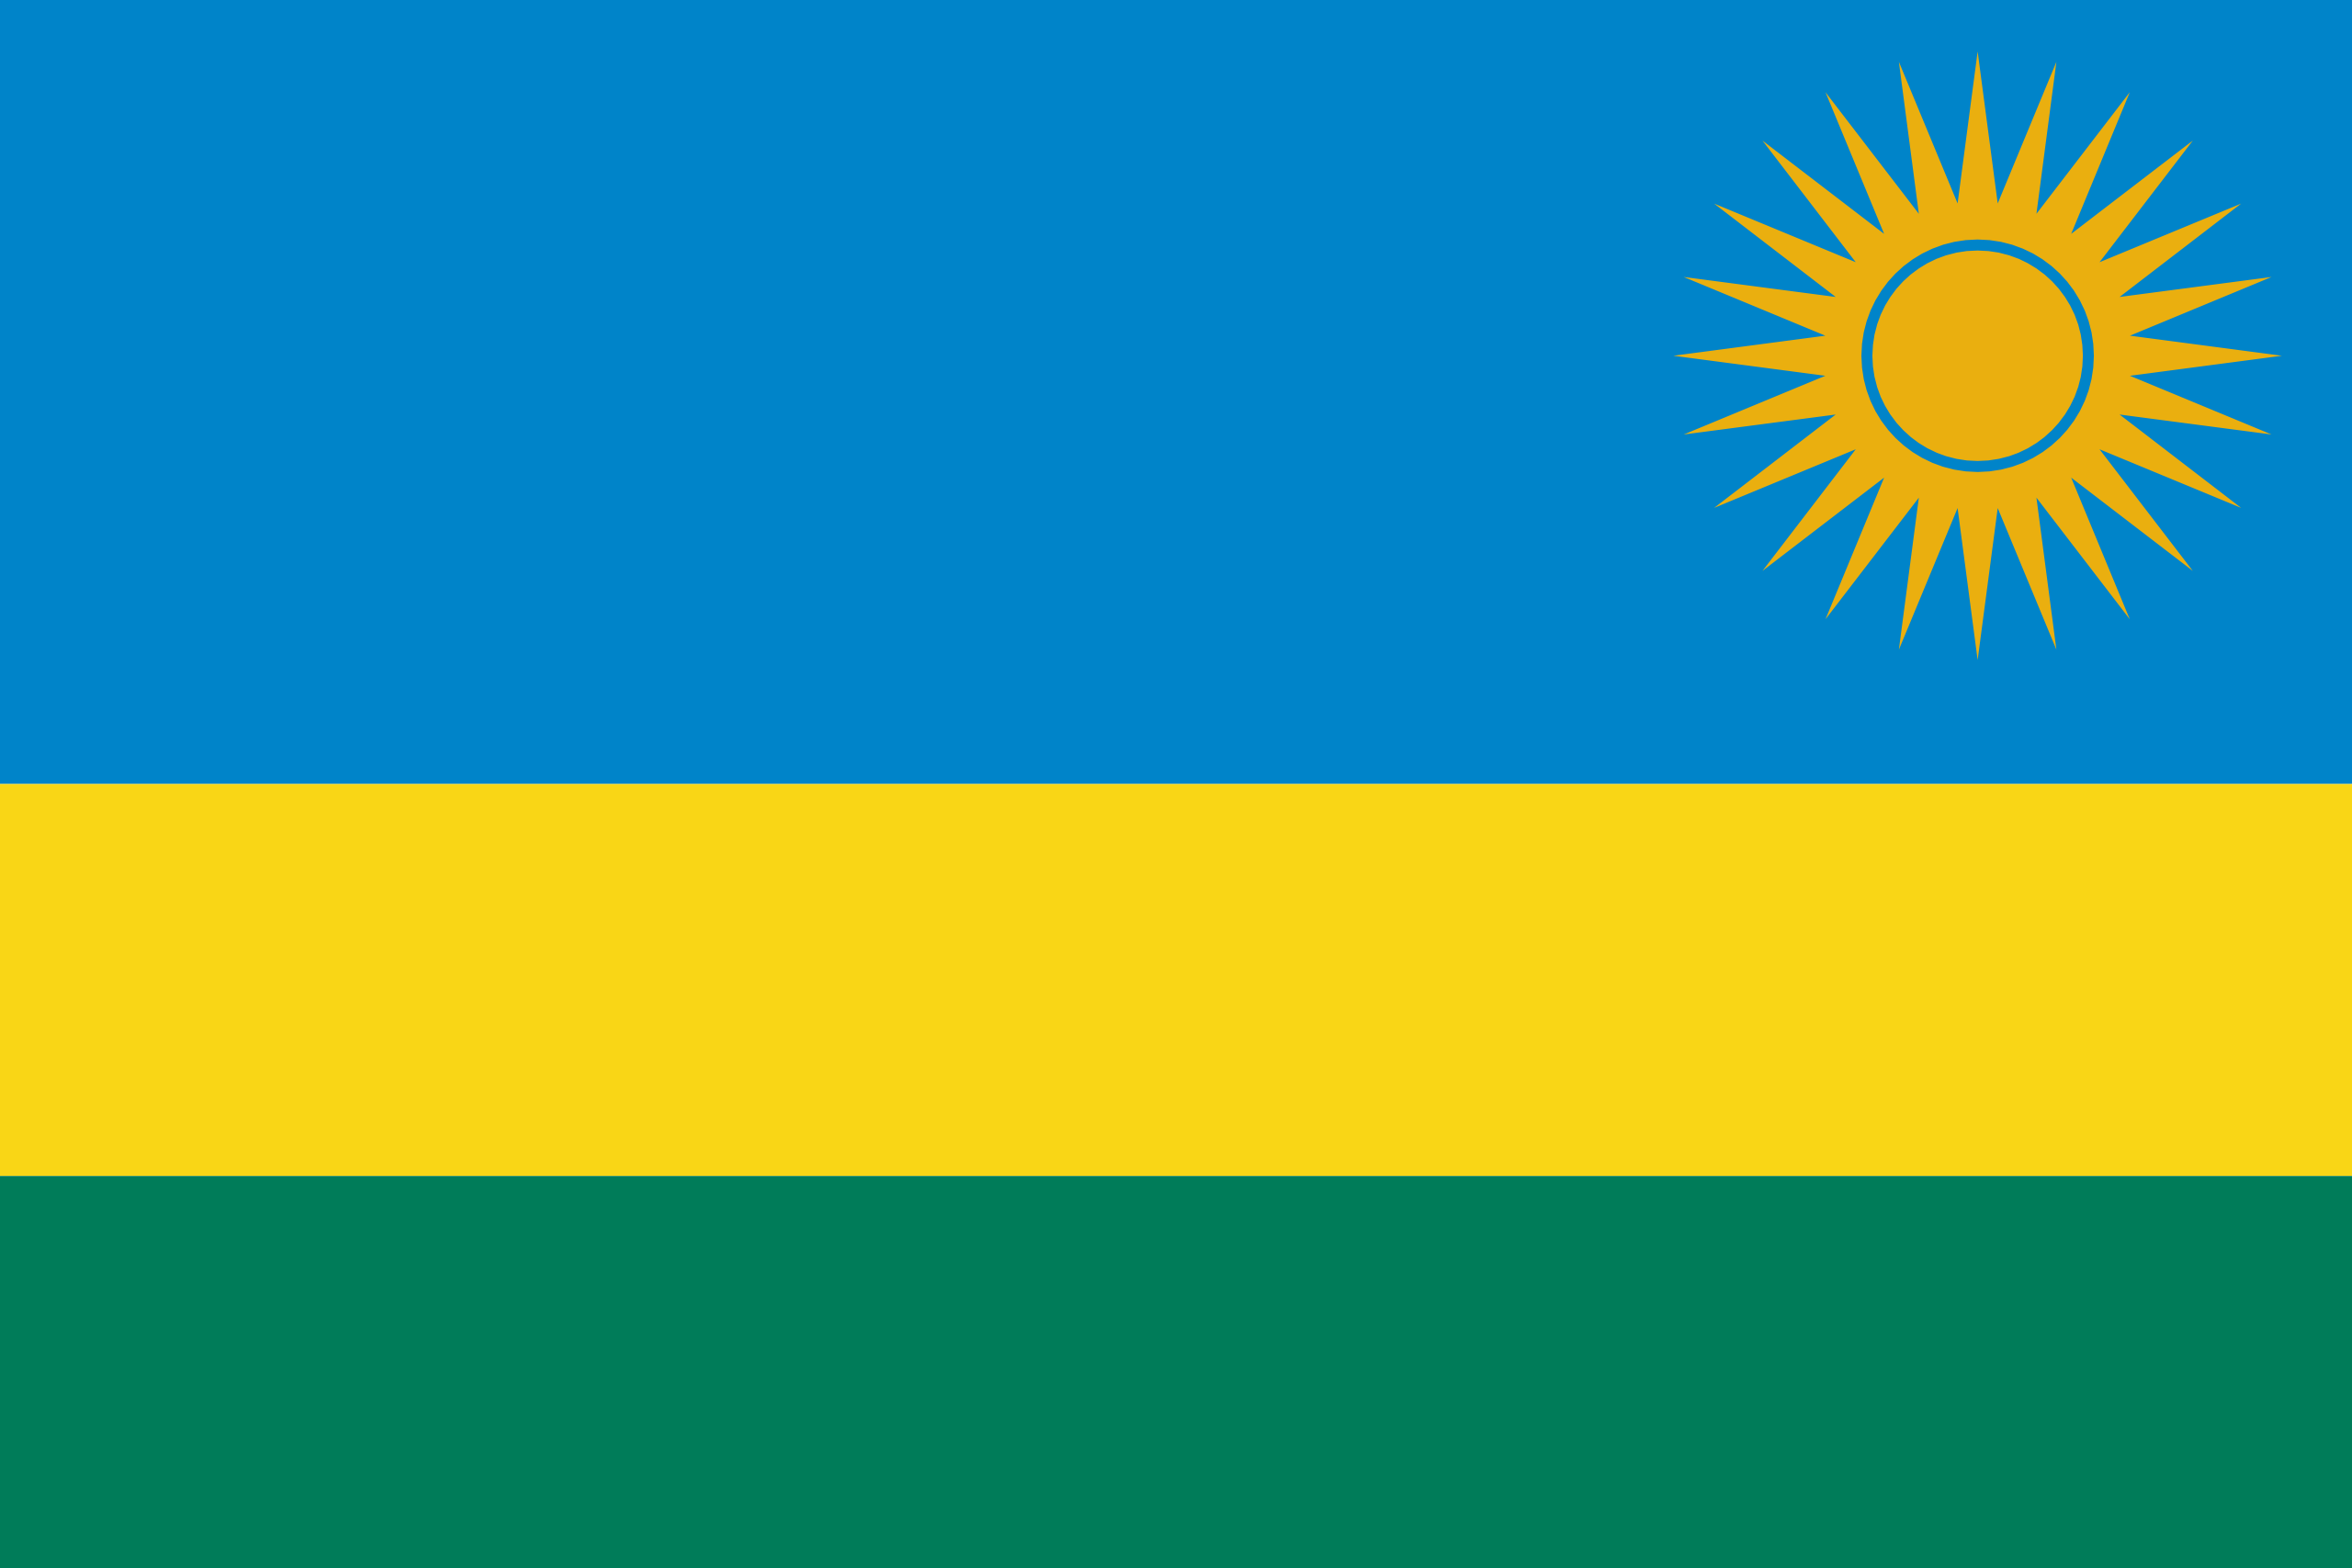 ruanda, χώρα, έμβλημα, λογότυπο, σύμβολο - Wallpapers HD - Professor-falken.com